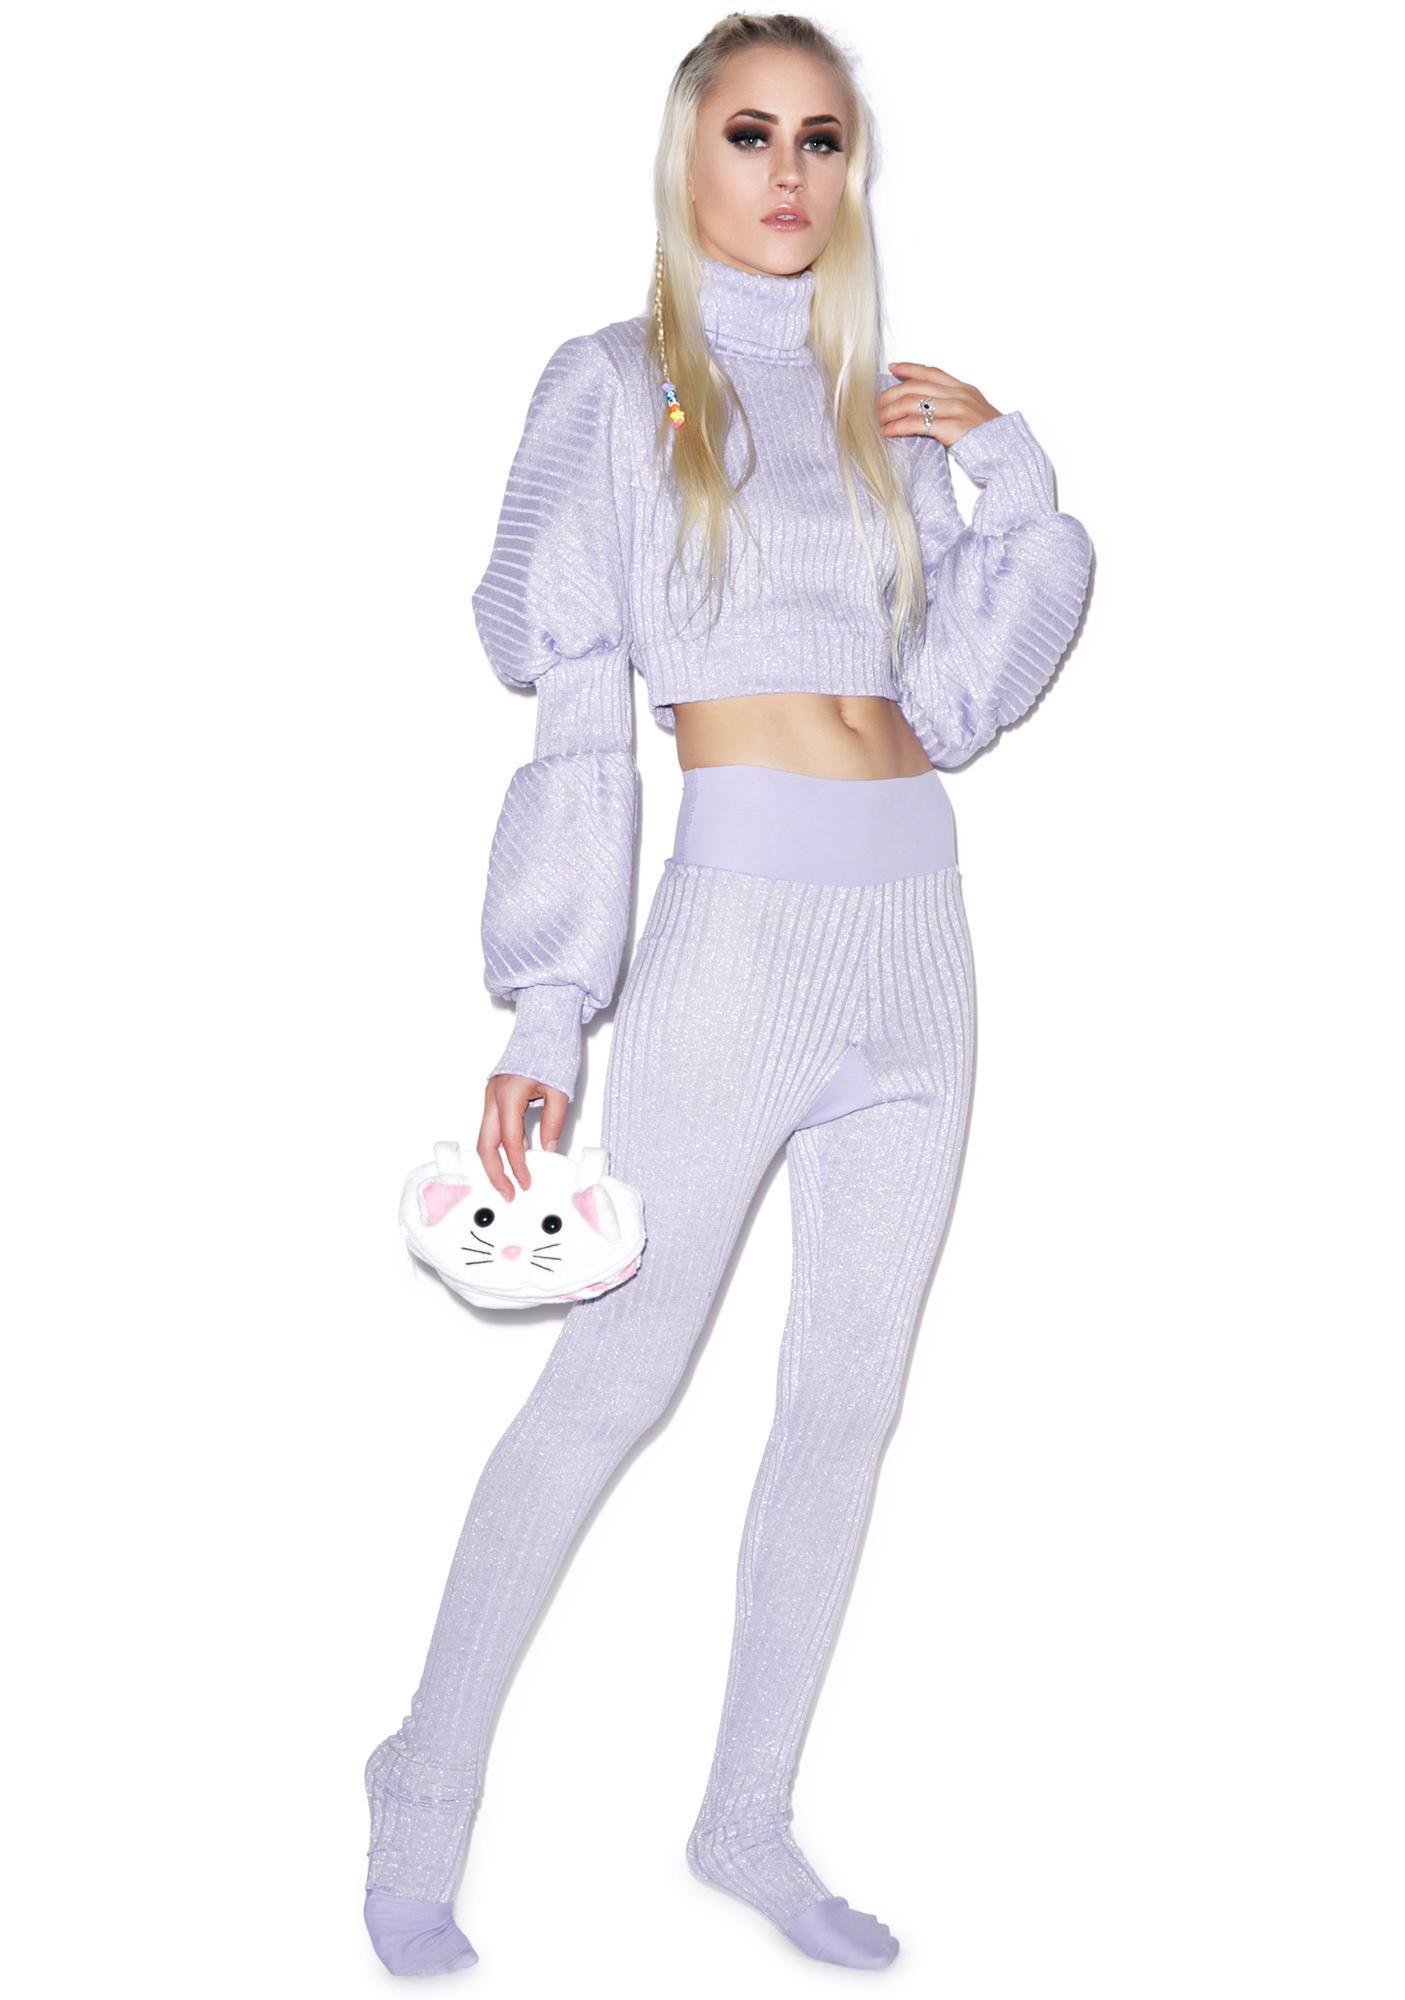 Mamadoux Snow Bunny Leggings